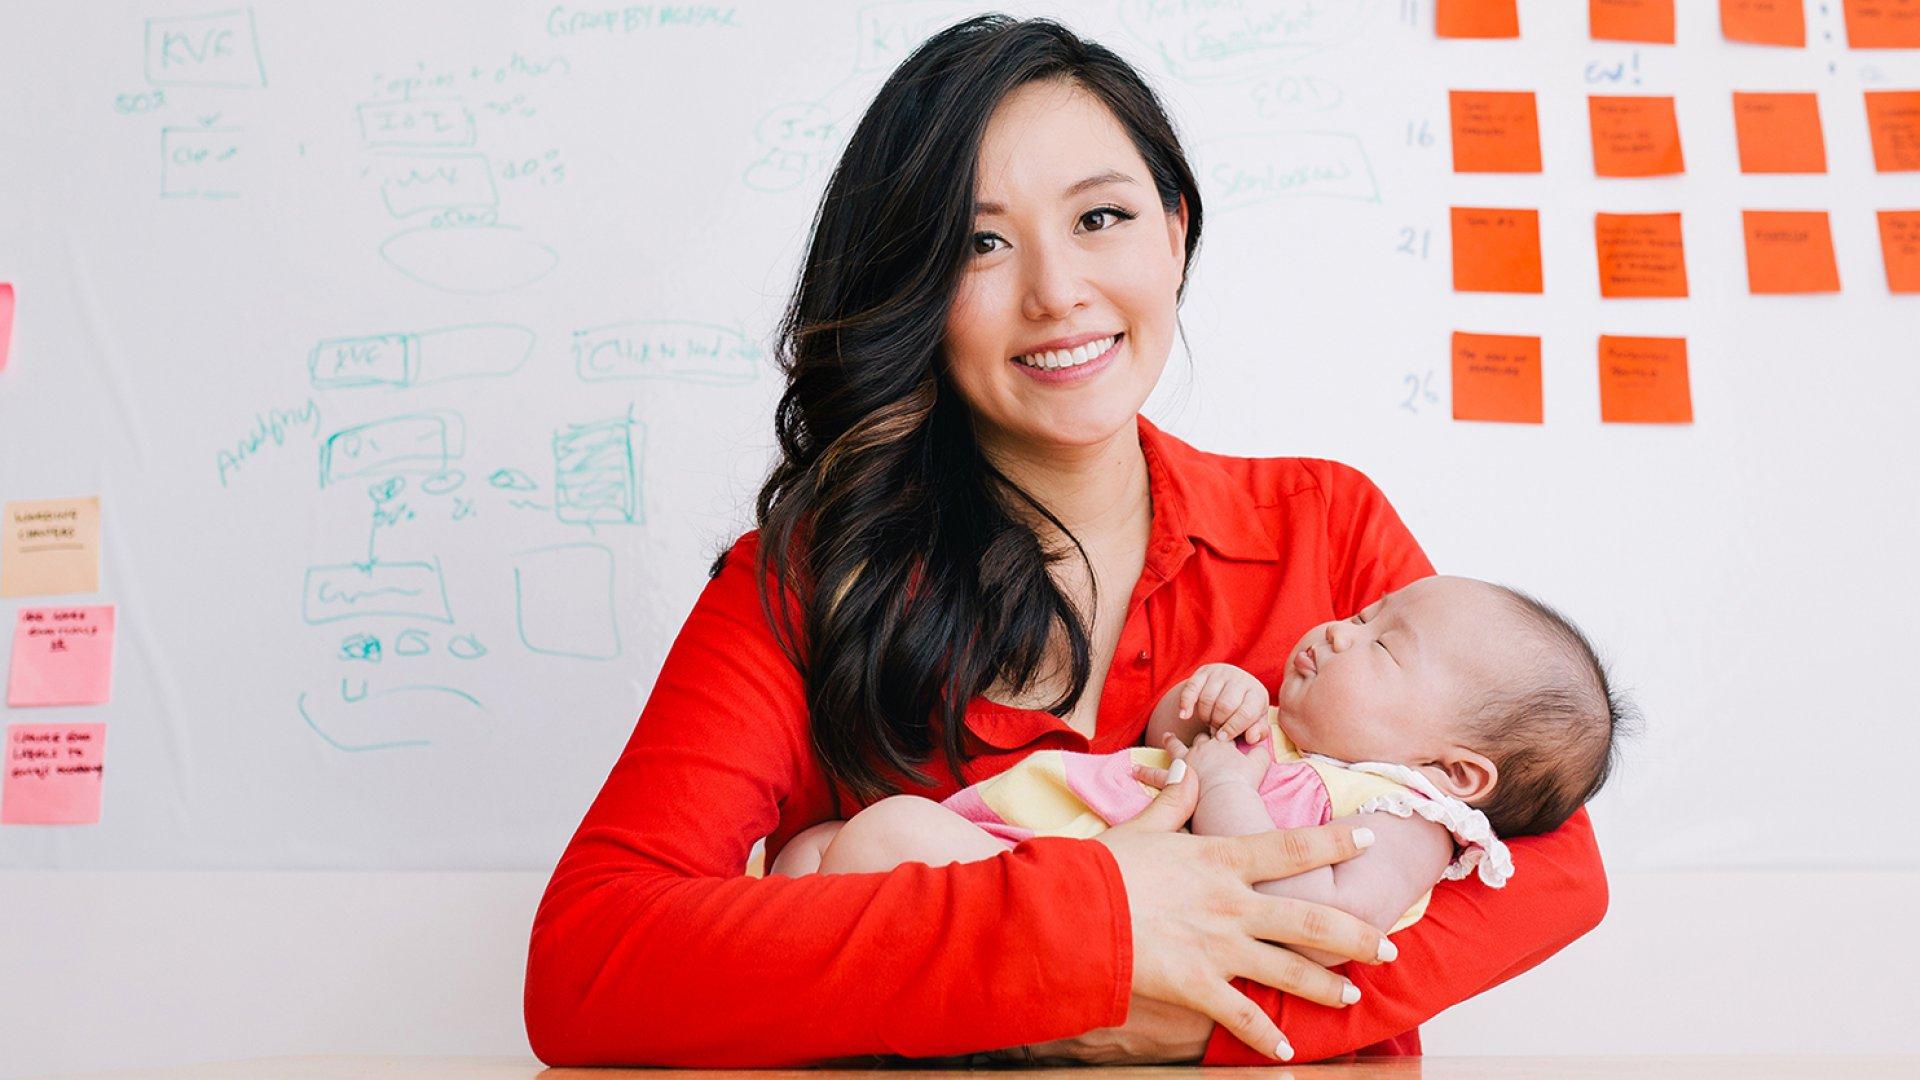 Carol Reiley, co-founder of Drive.ai and new mom to daughter Nova.